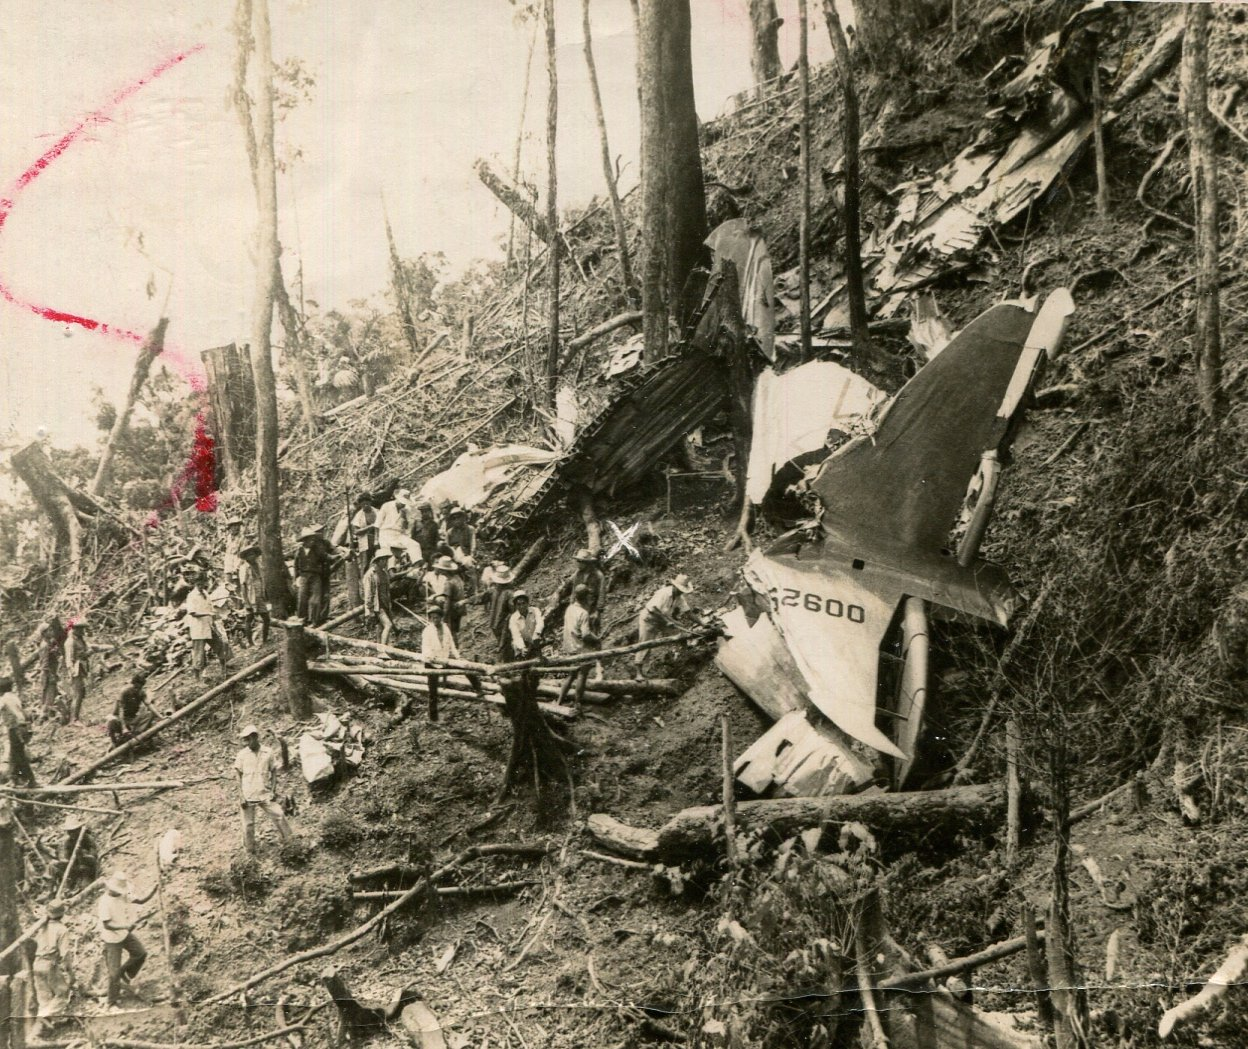 philippines airplane crash 1957